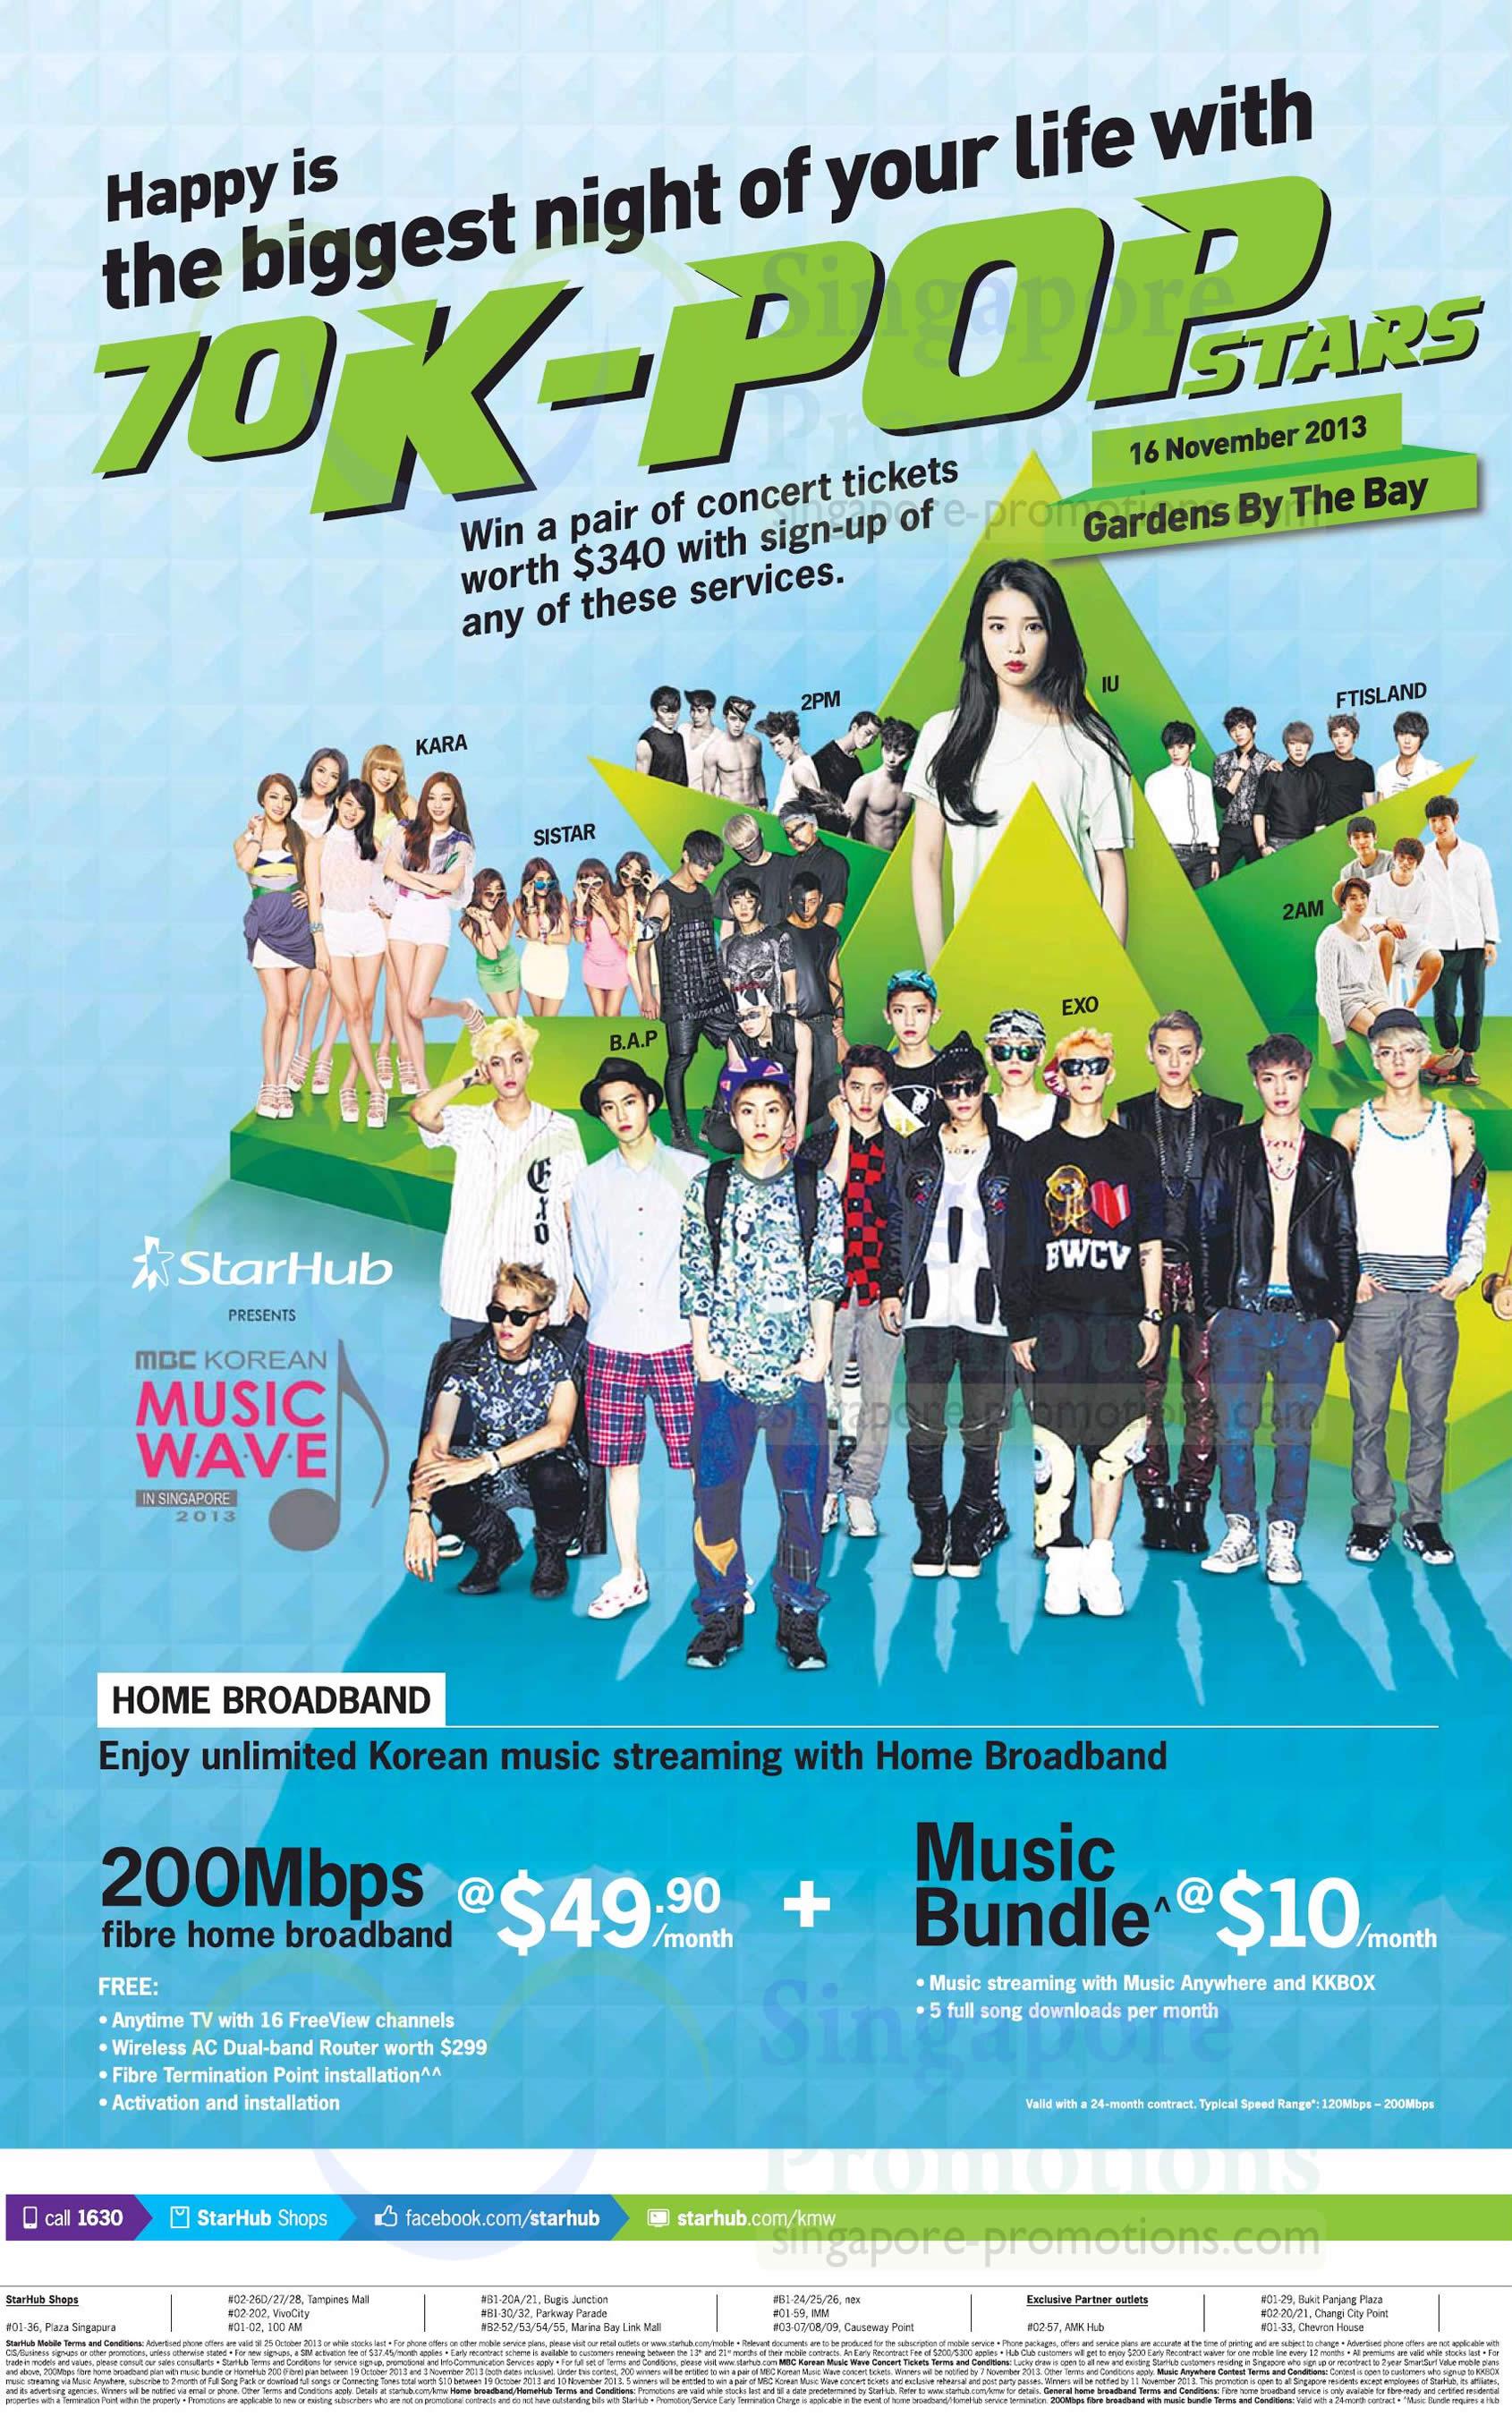 49.90 200Mbps, Music Bundle Unlimited Korean Music Streaming